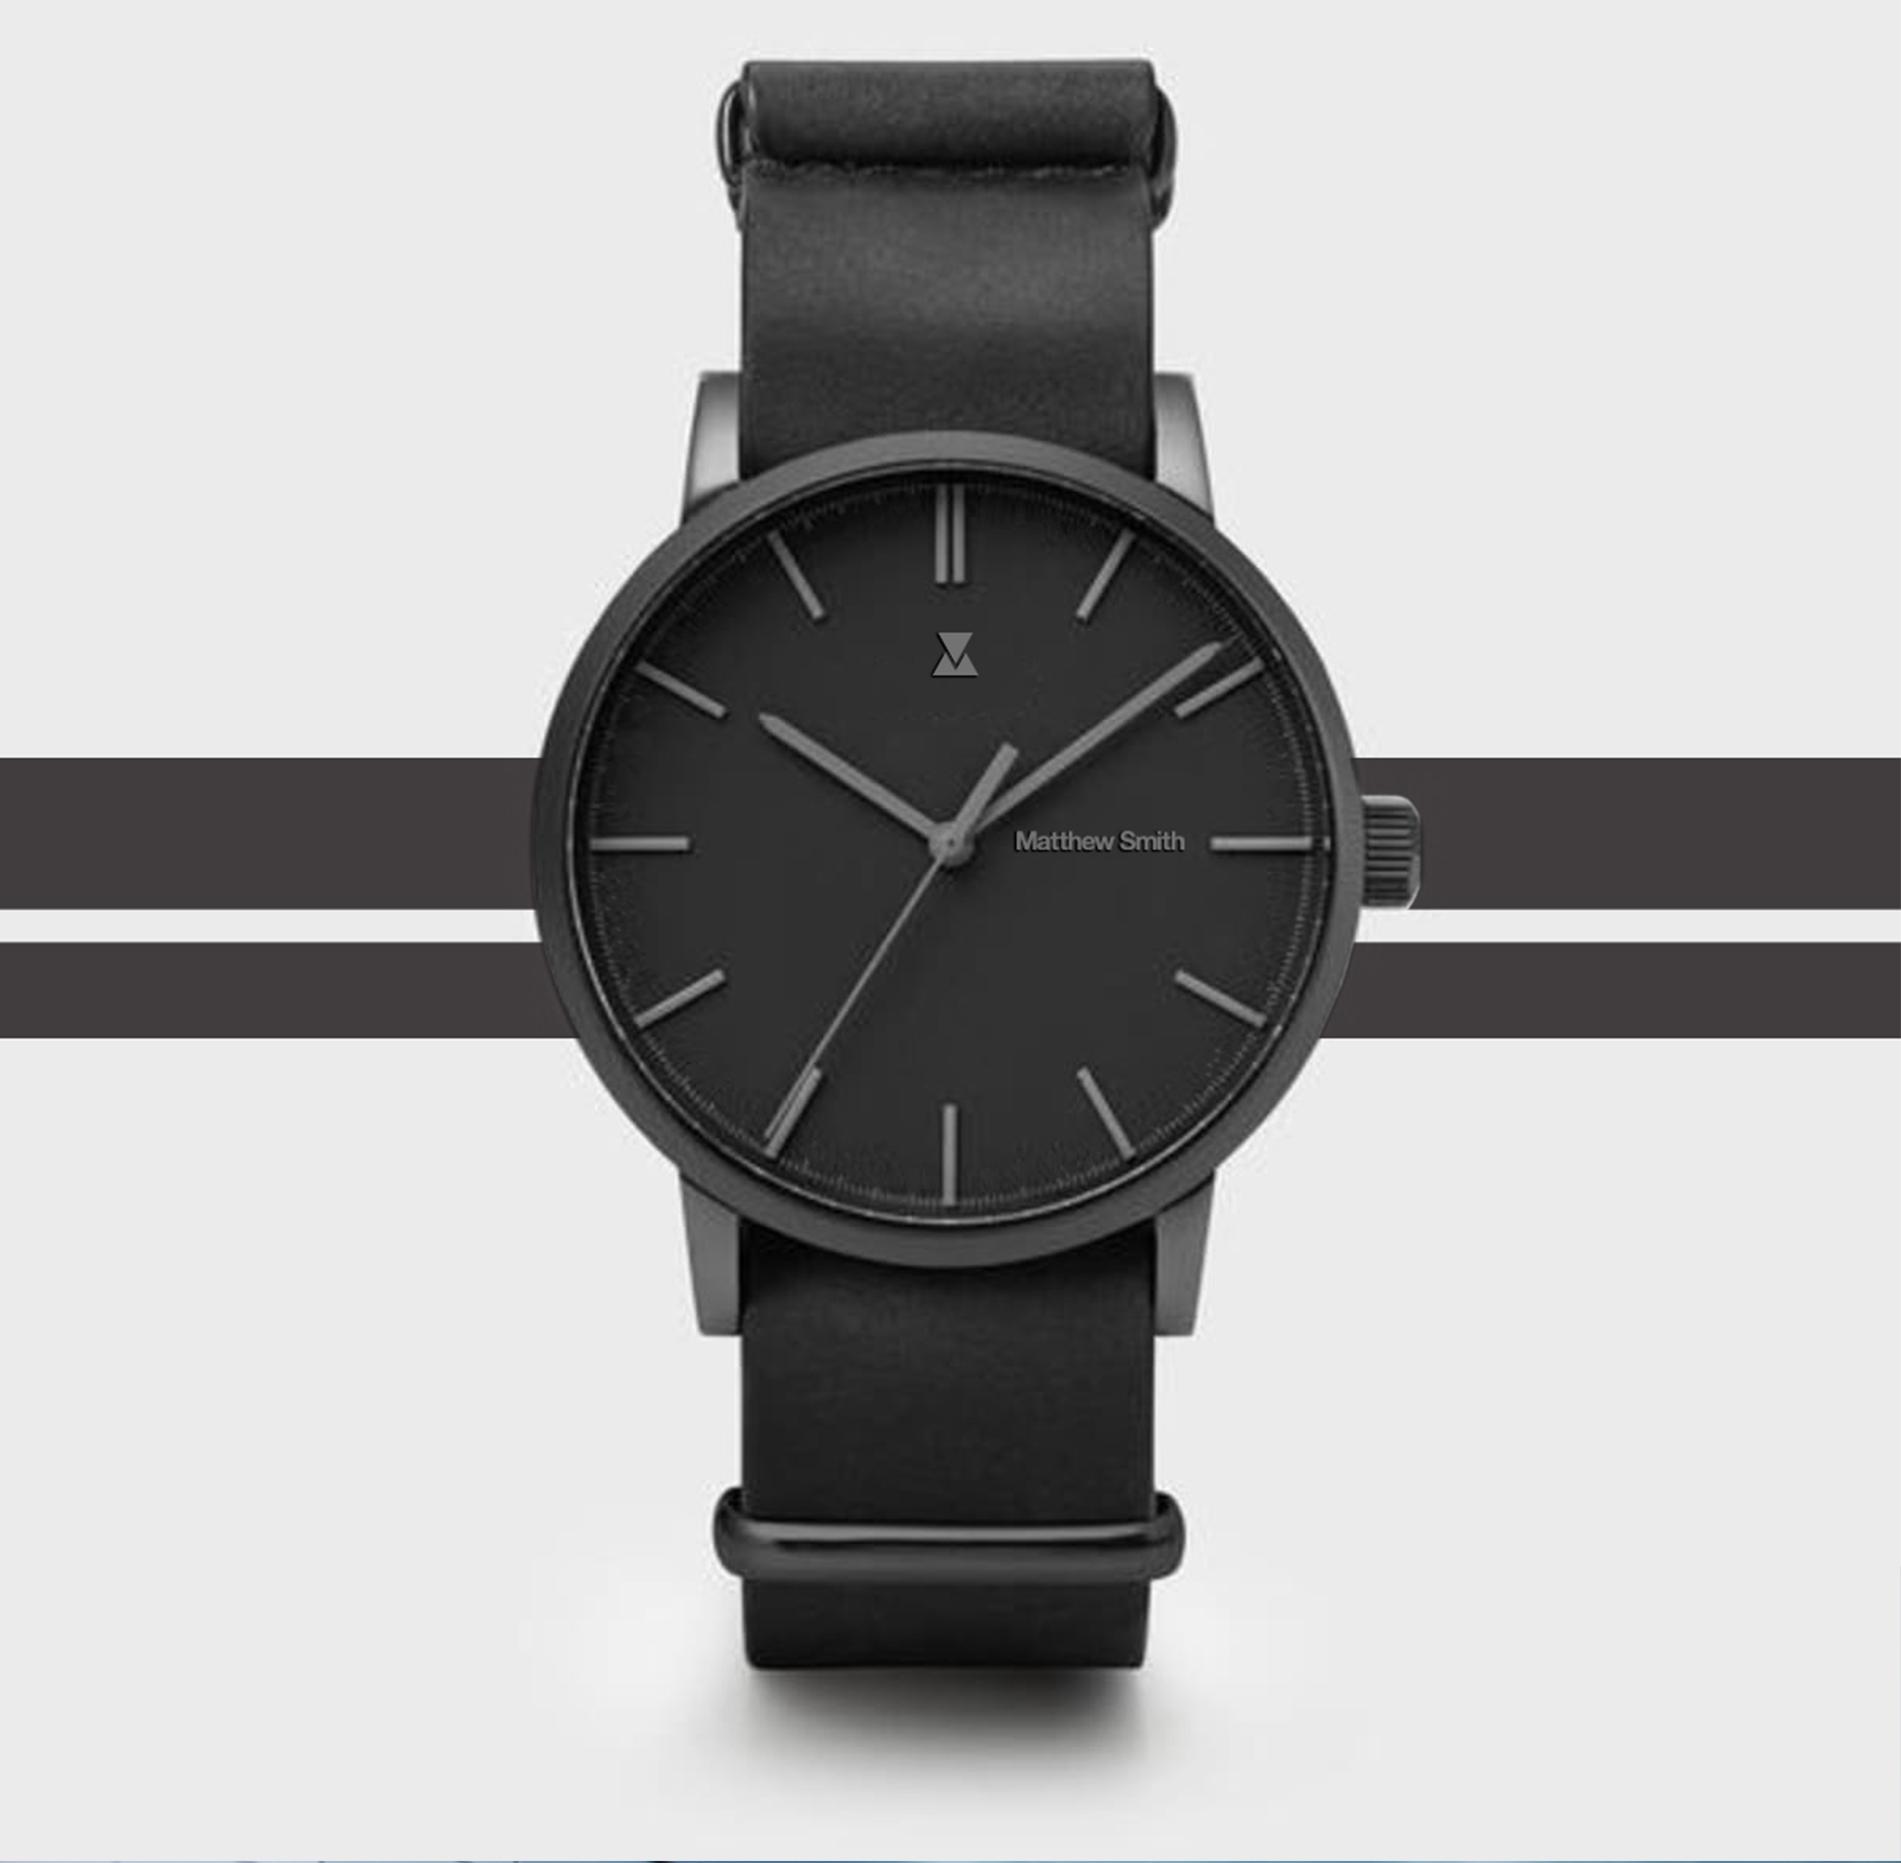 Premium swiss made watches identity design https://dribbble.com/Andonov-Design